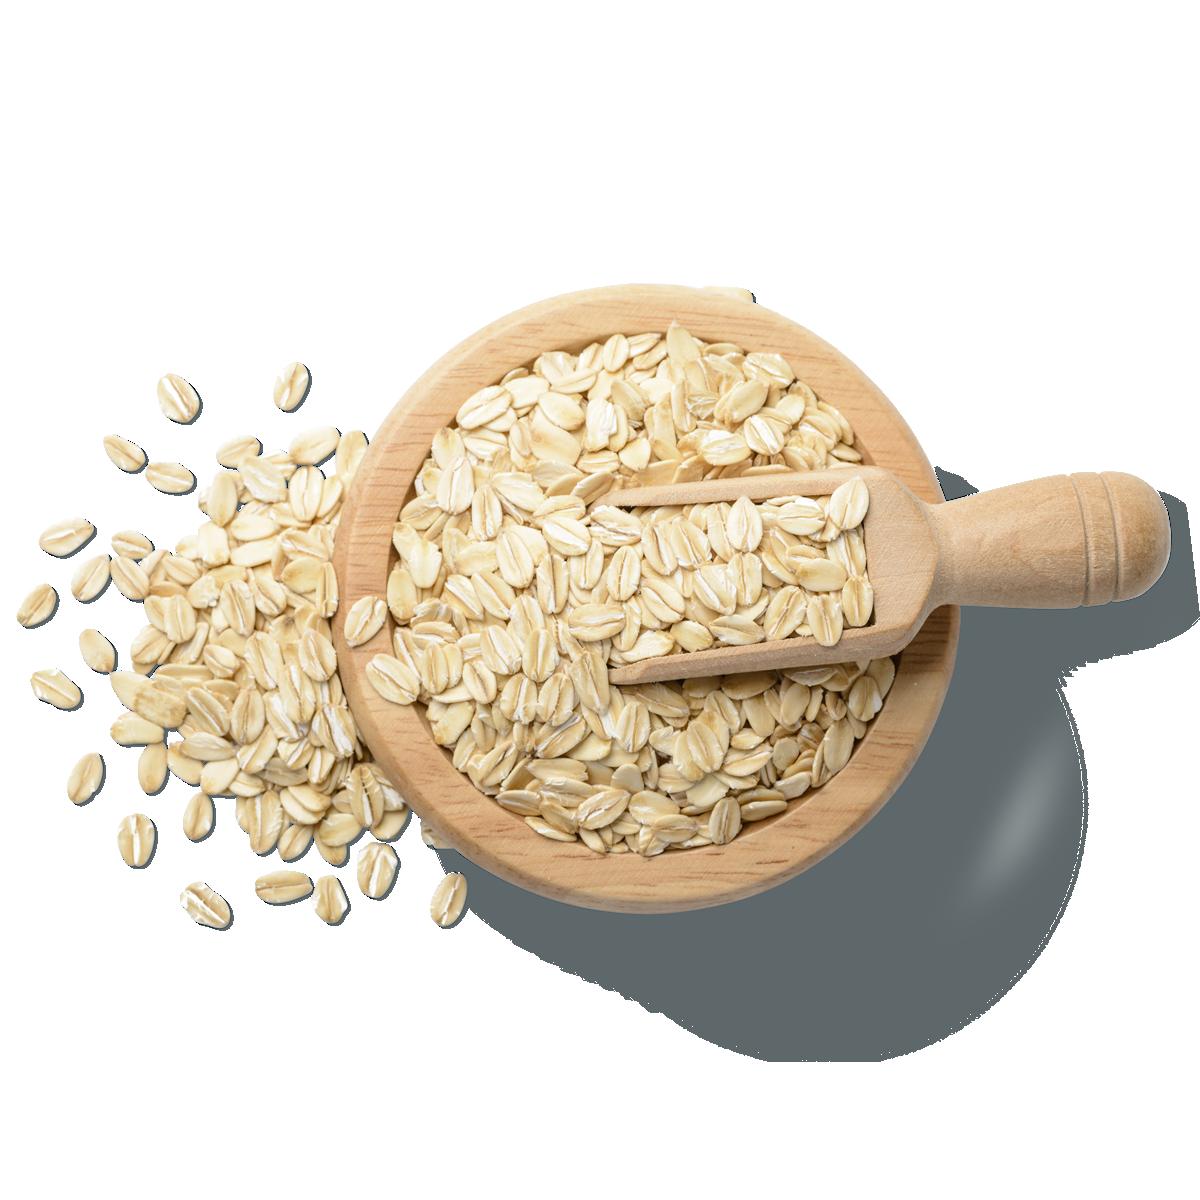 Oat bran,Food,Breakfast cereal,Groat,Cuisine,Oat,Cereal.